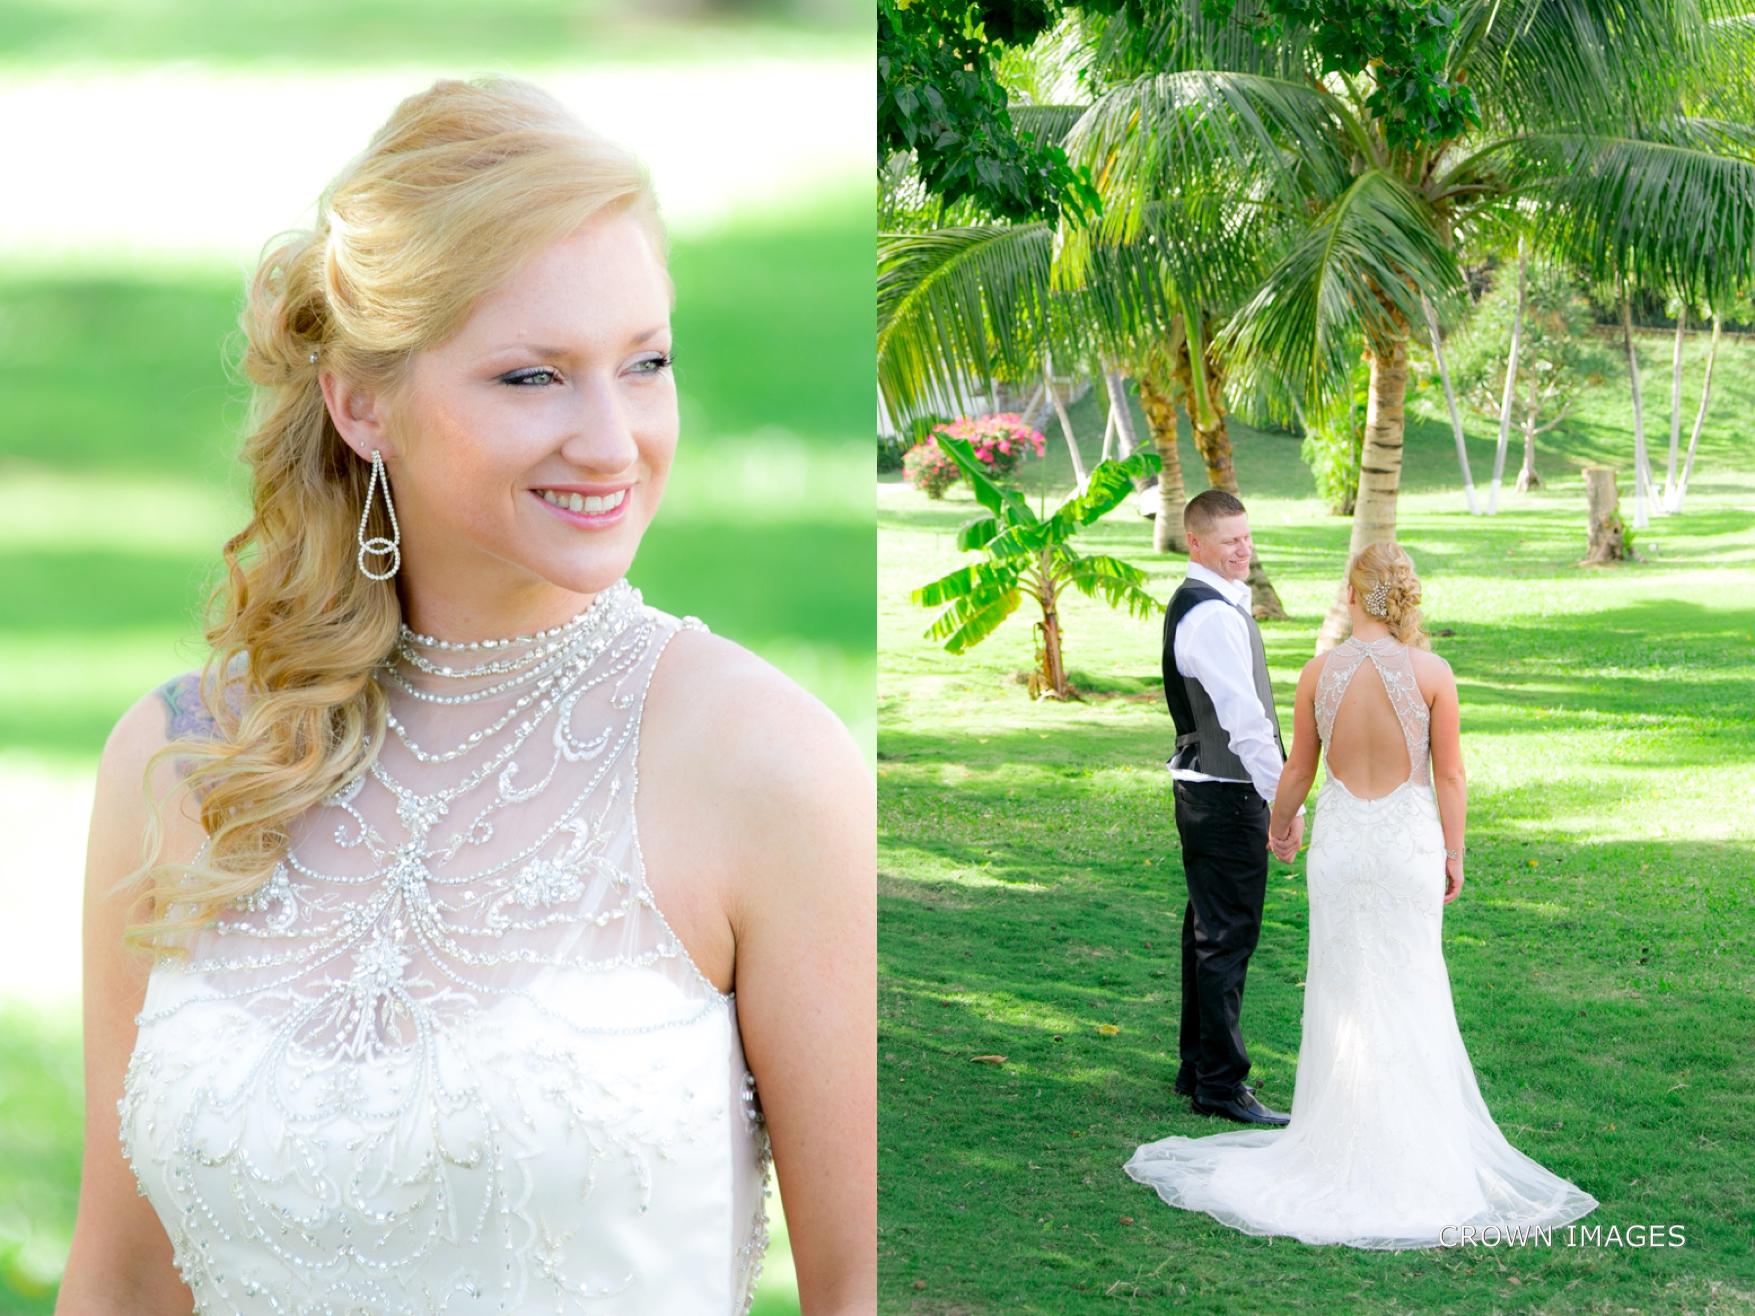 wedding_photos_saint_thomas_crown_images_0594.jpg